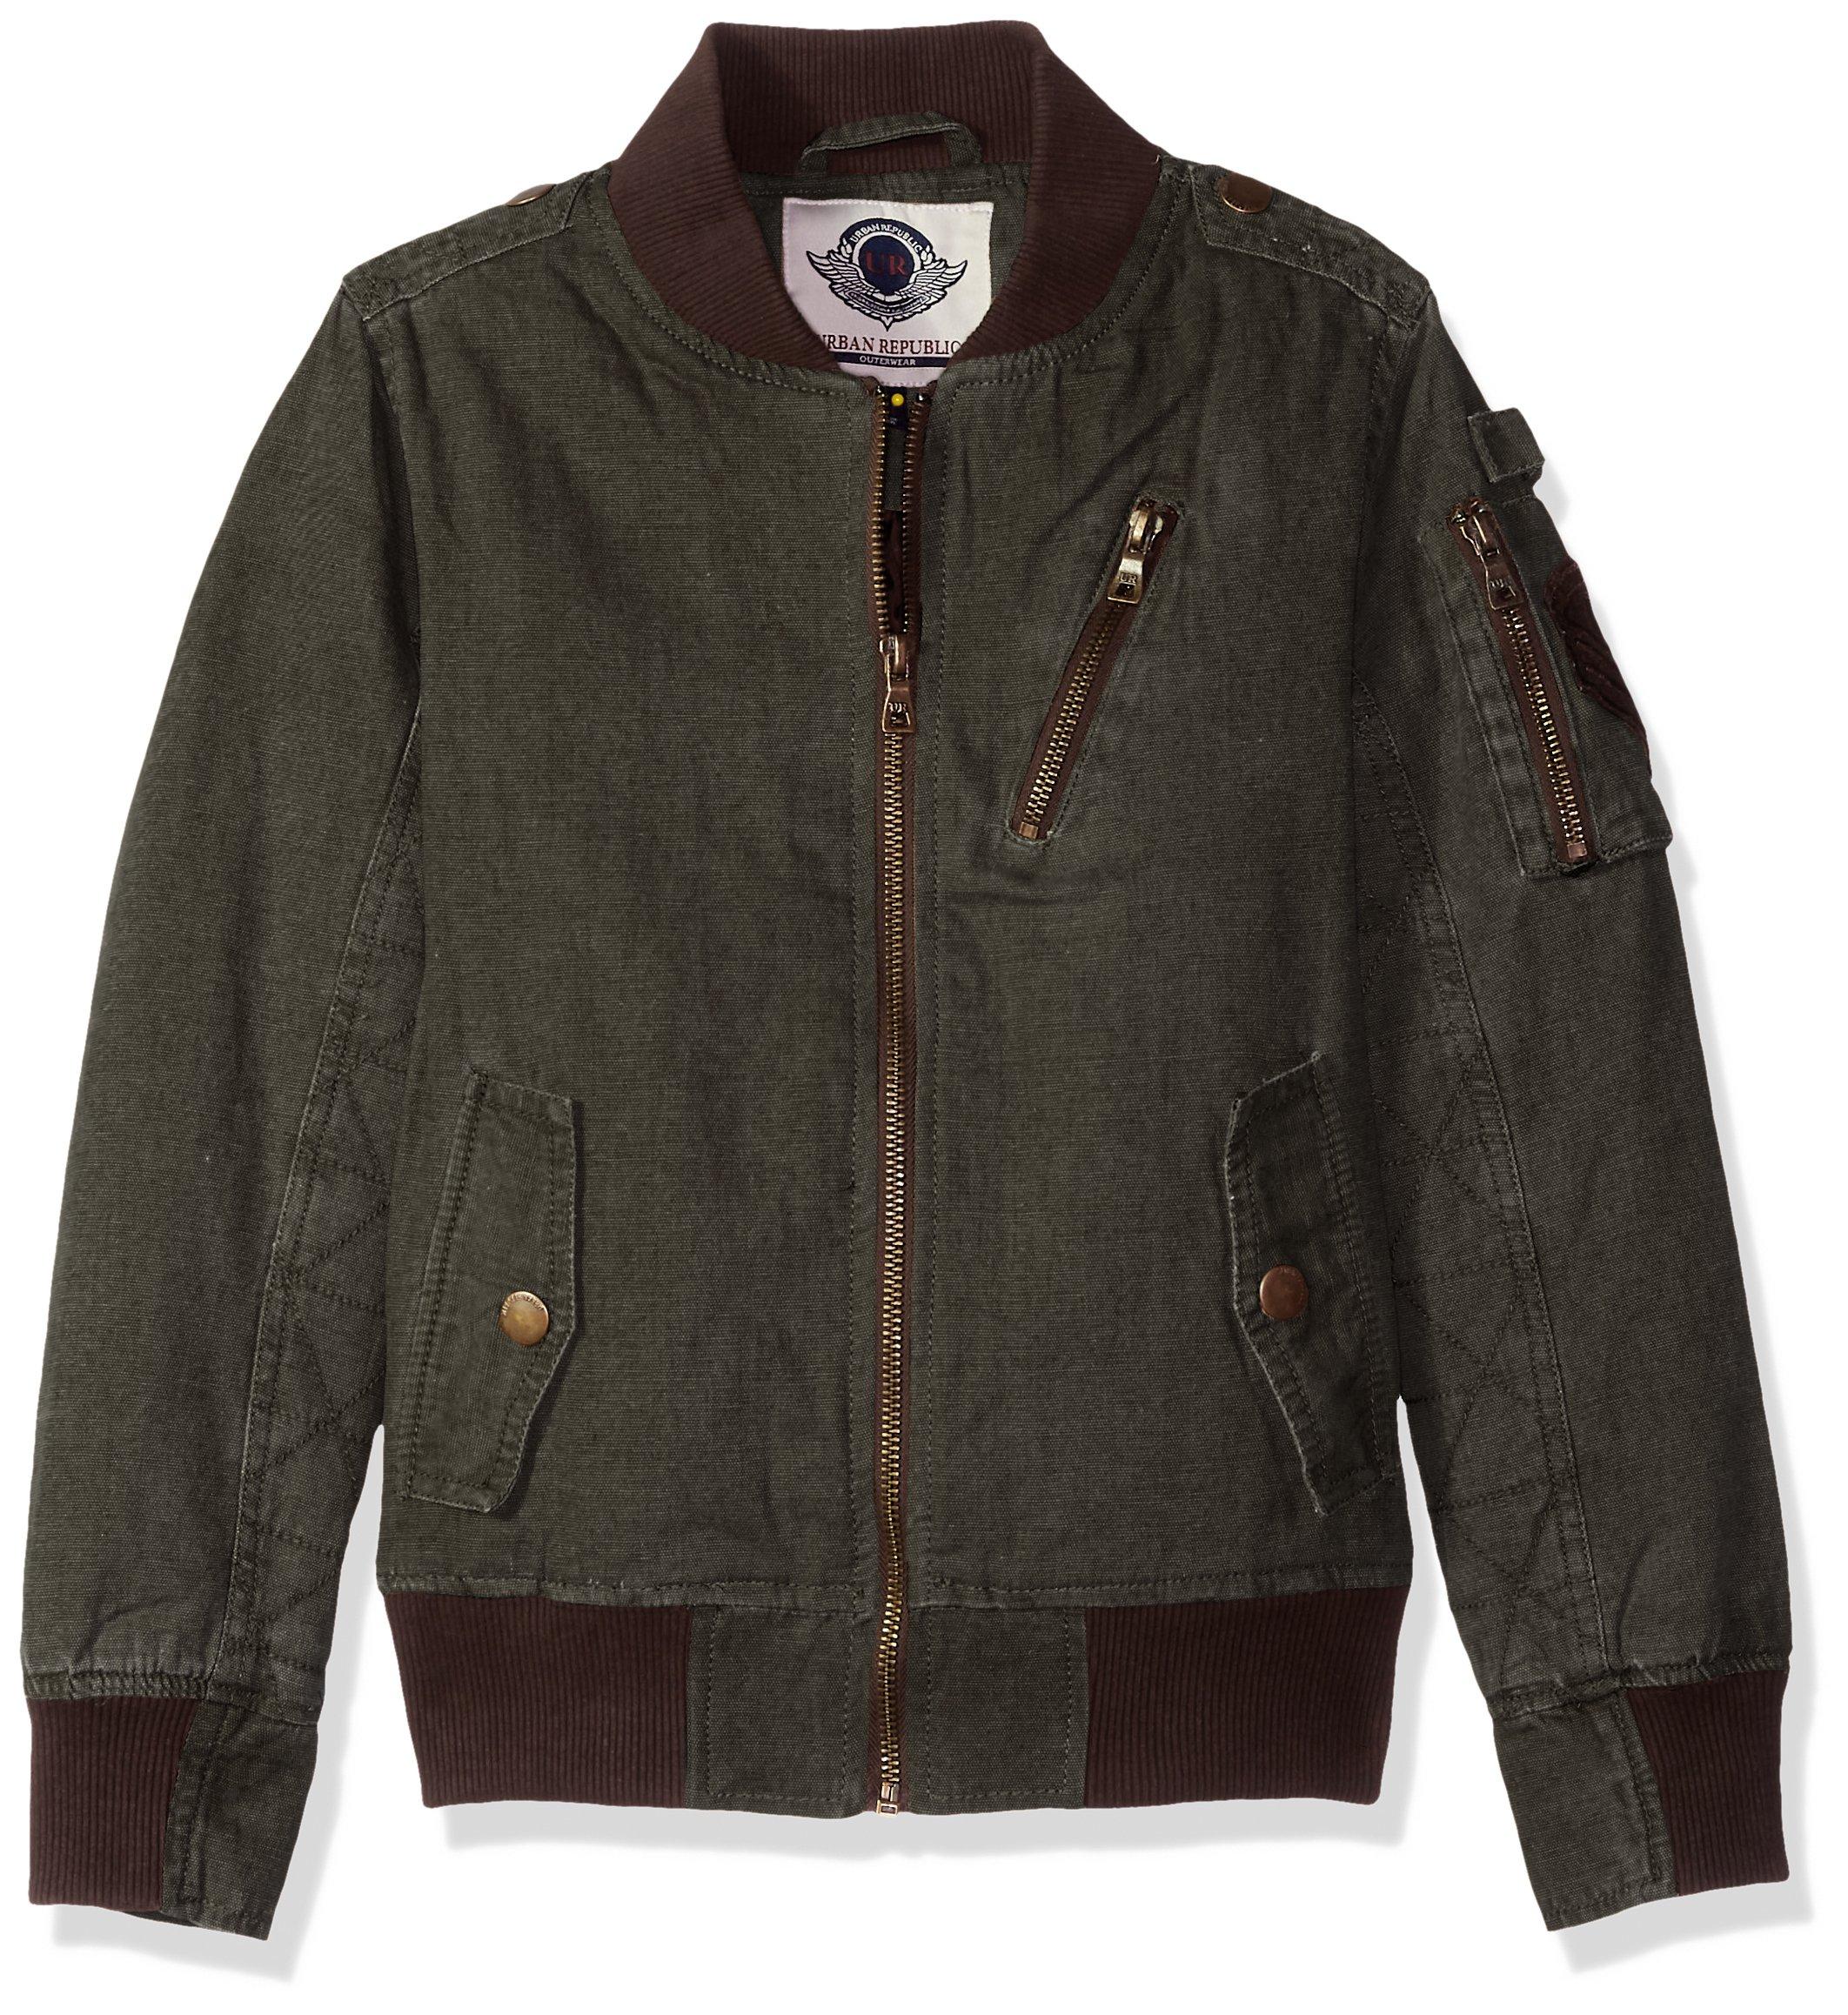 Urban Republic Big Boys' Aviator Cotton Canvas Jacket, Olive, 14/16